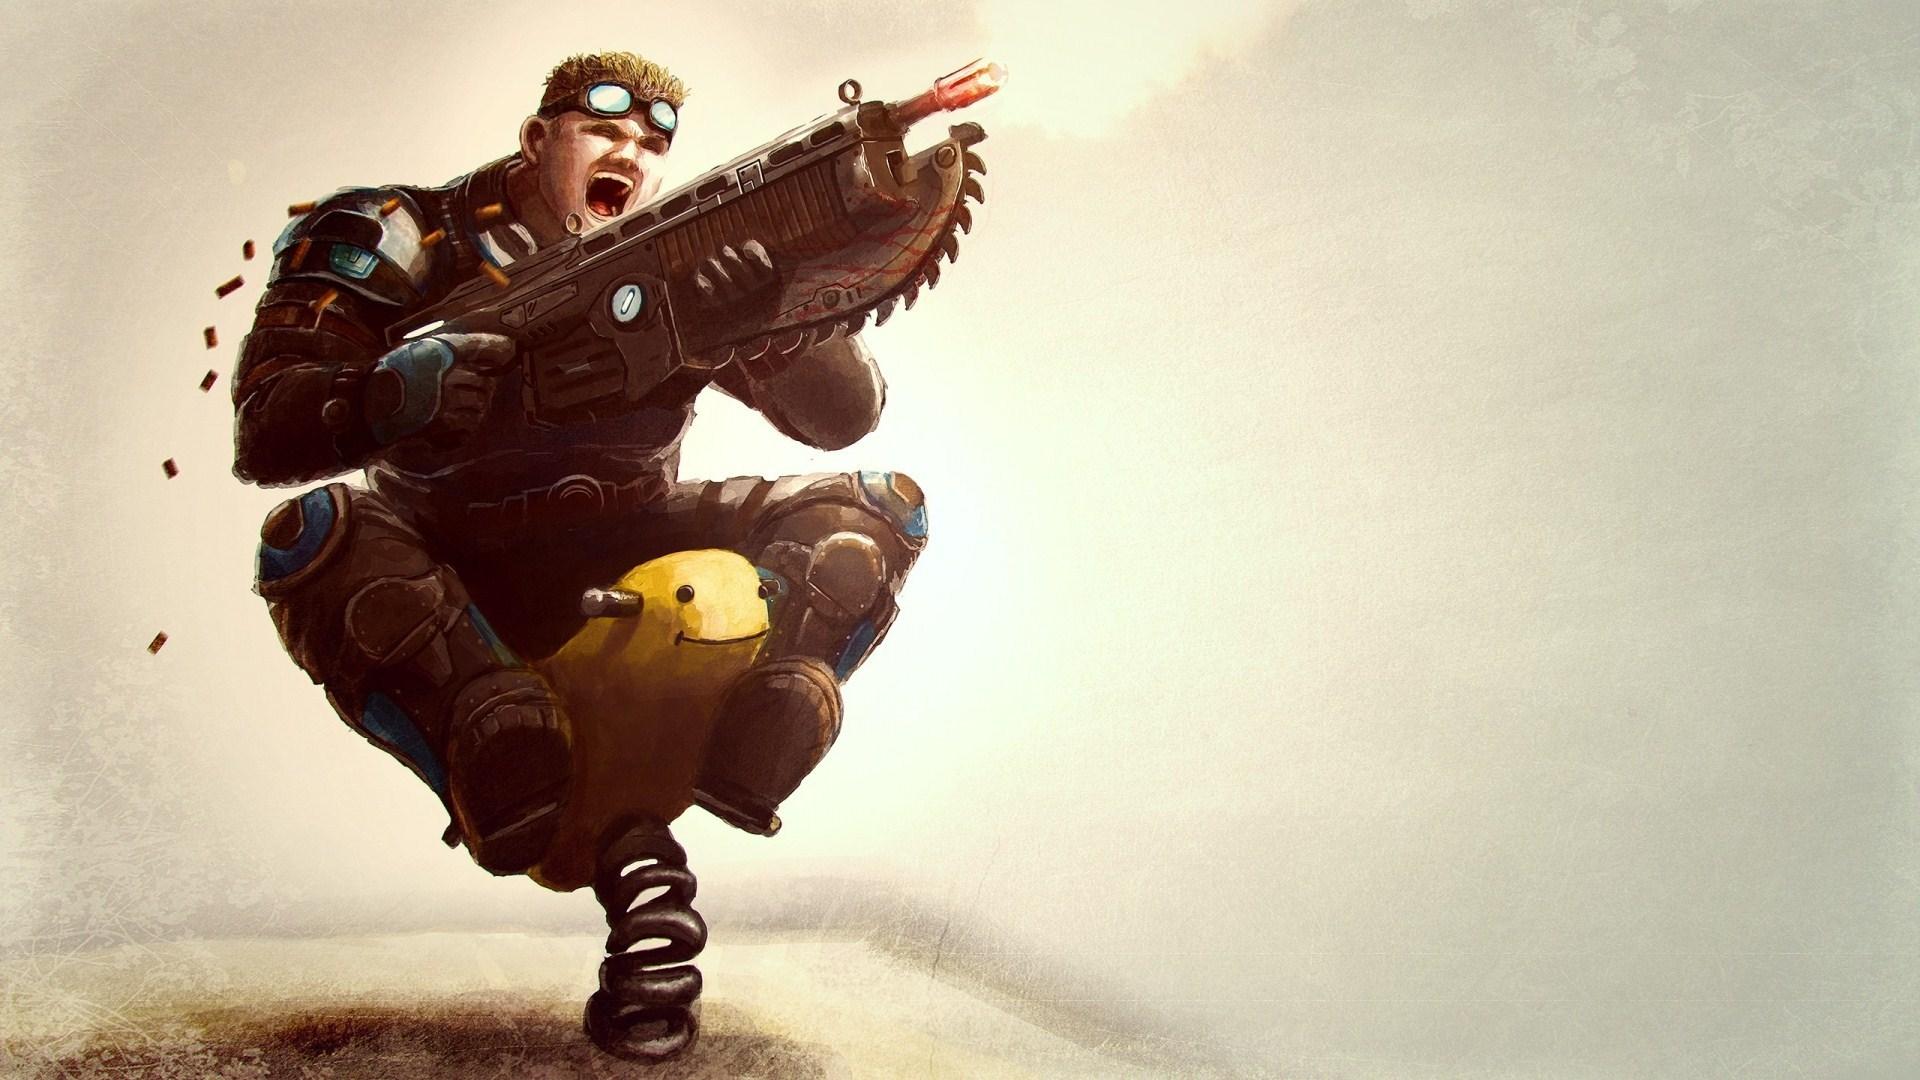 Gears of War Soldier Gun Game Funny Creative